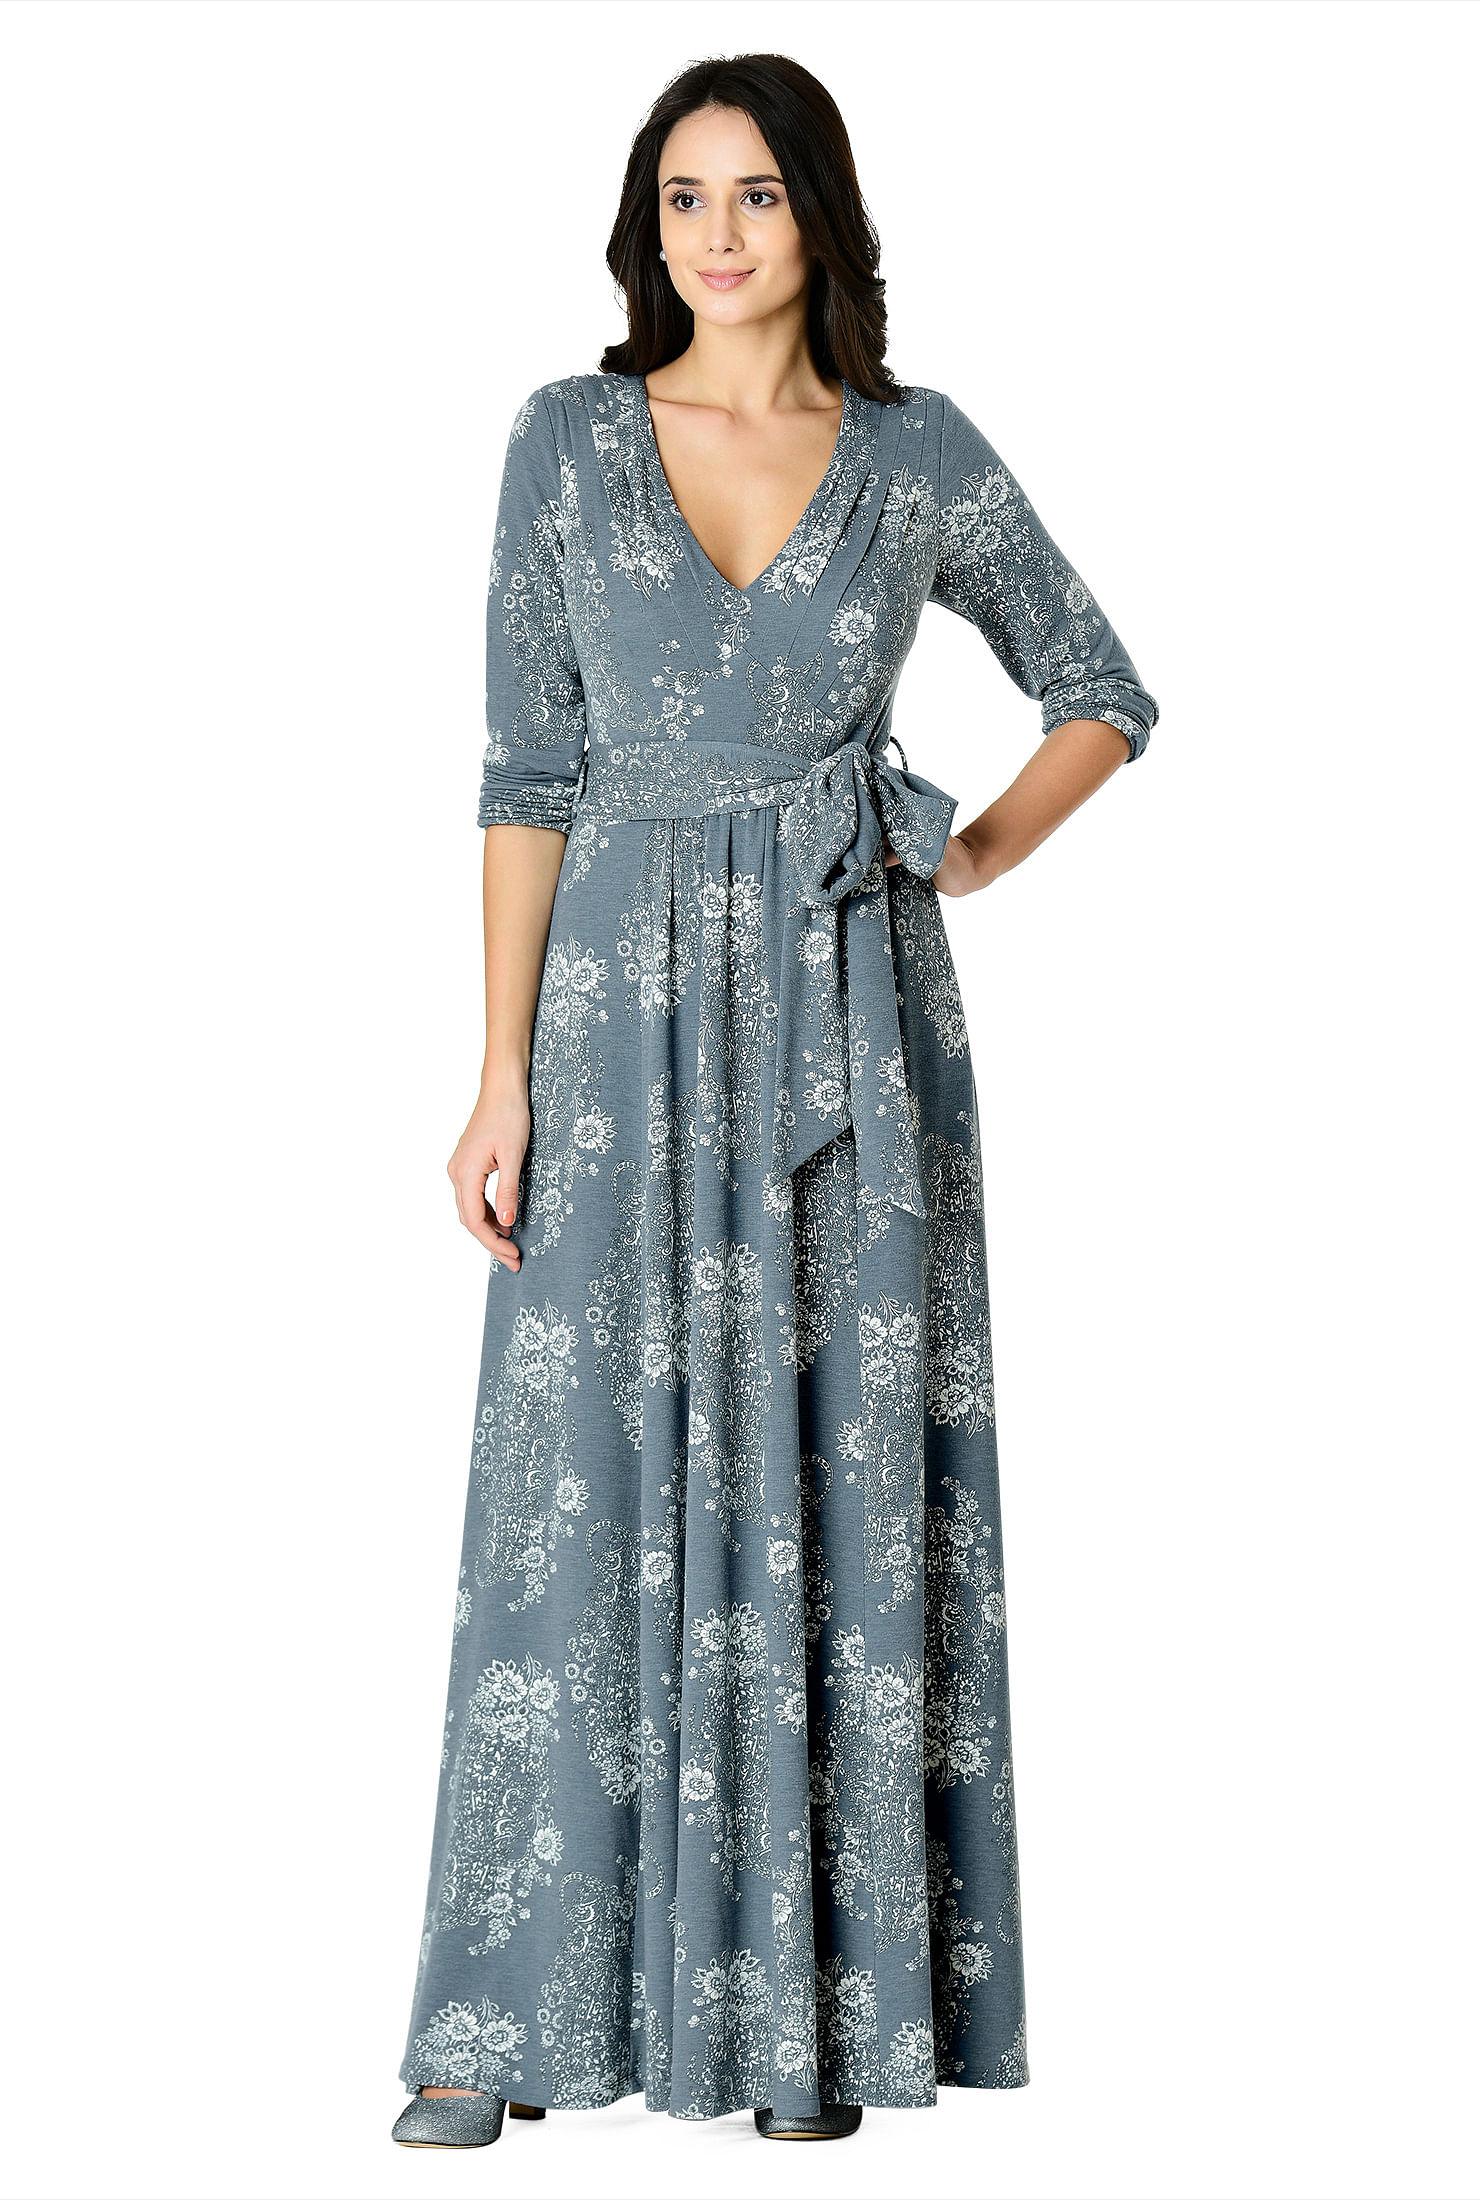 3a652a4cd6989 Women's Fashion Clothing 0-36W and Custom